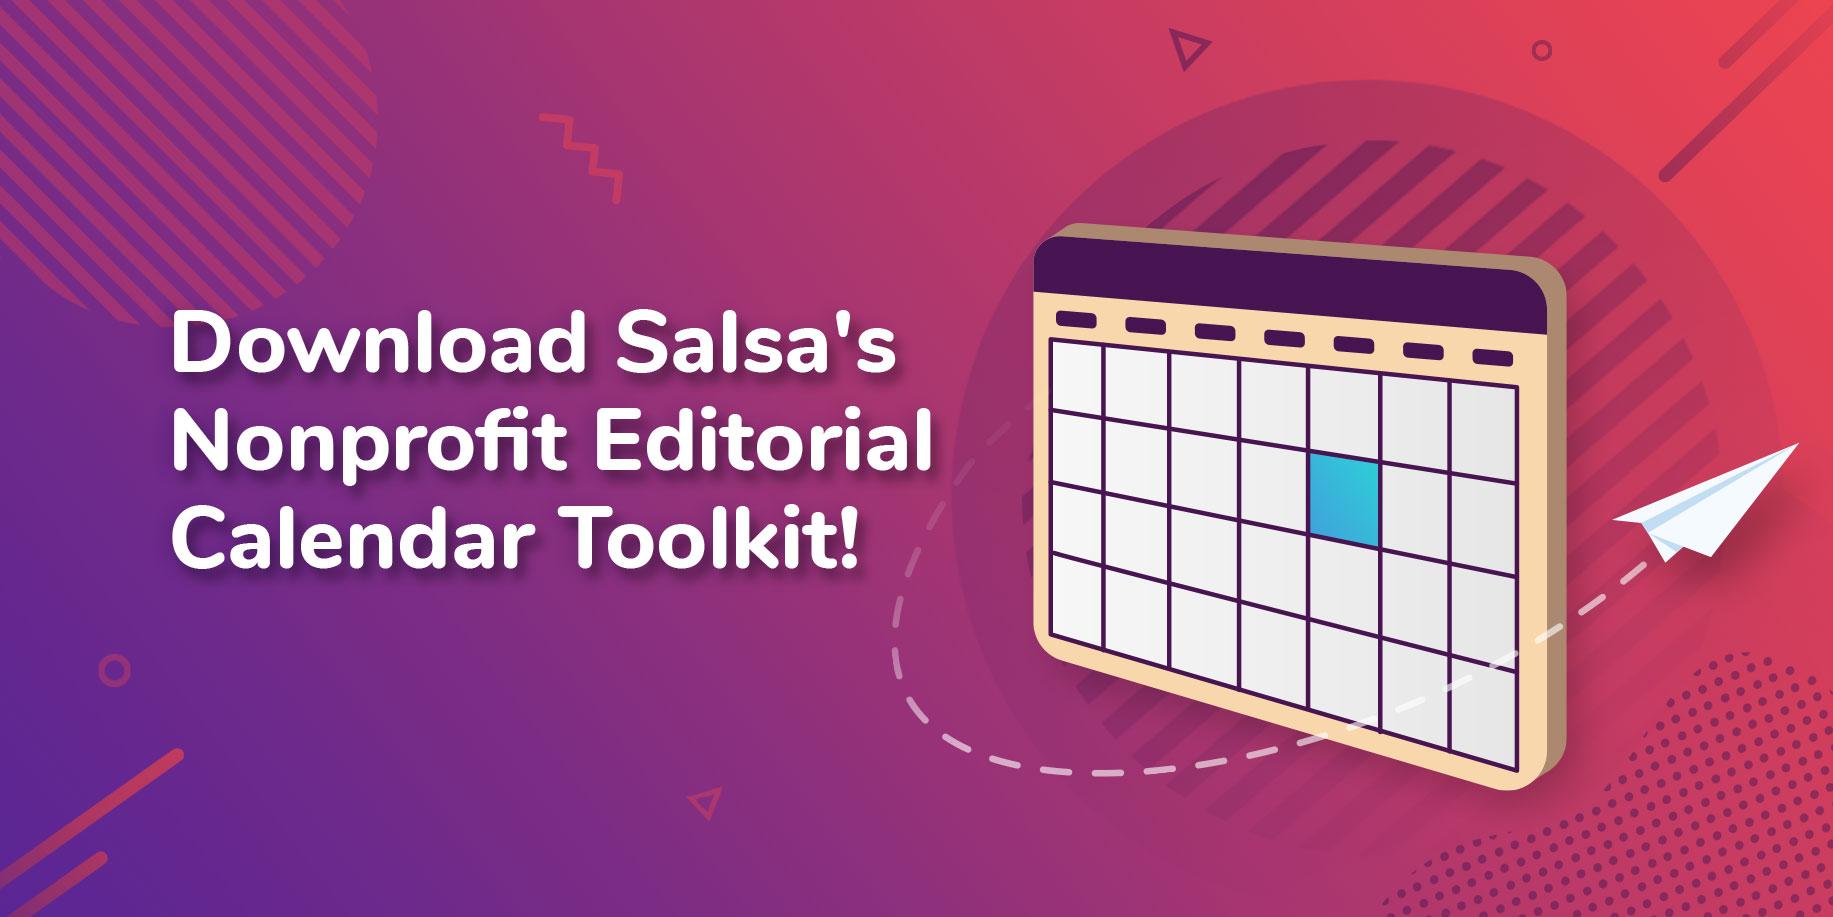 Get Organized With a Nonprofit Editorial Calendar